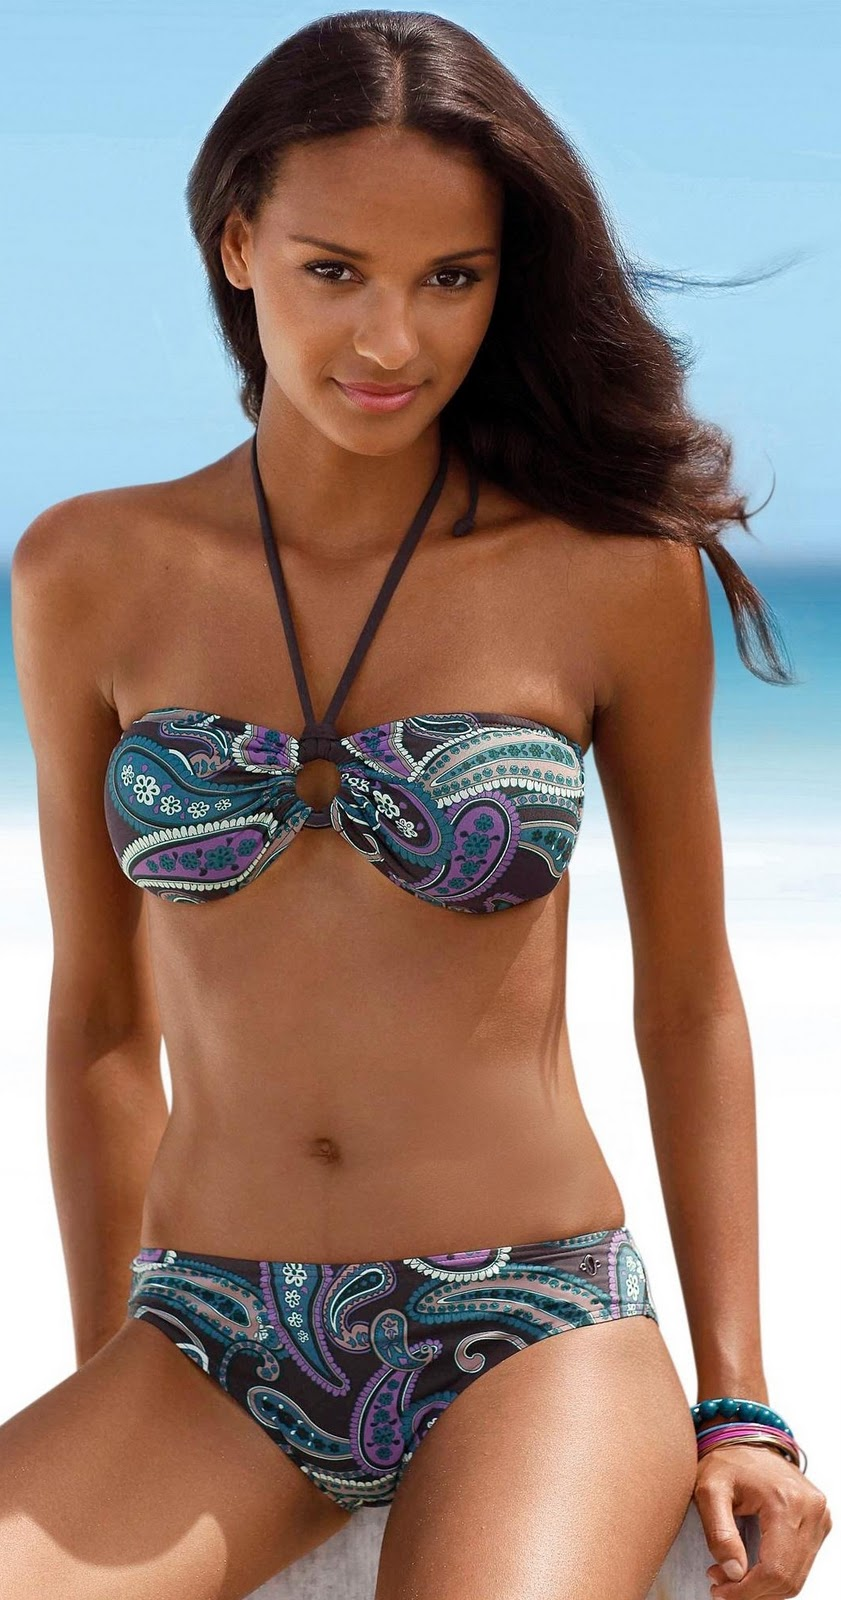 Carvalho bikini gracie